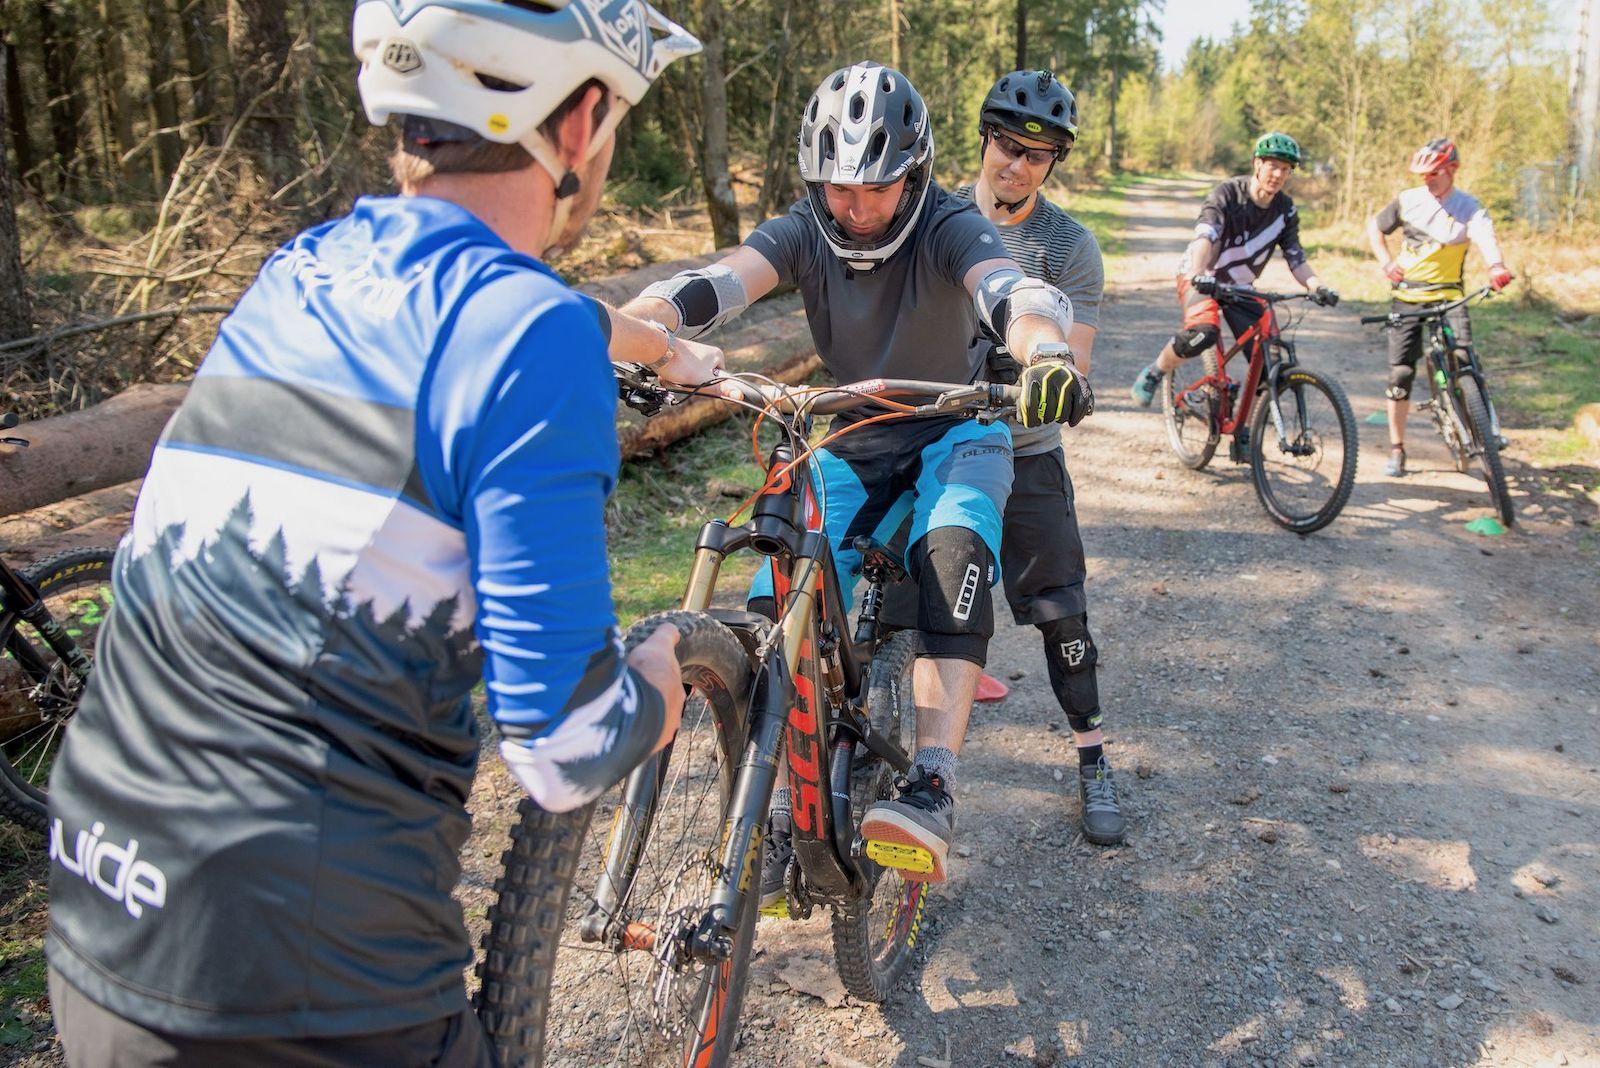 Fahtechnik Kurse Bikepark OE Olpe Fahlenscheid Sprung Training Rock my Trail -1